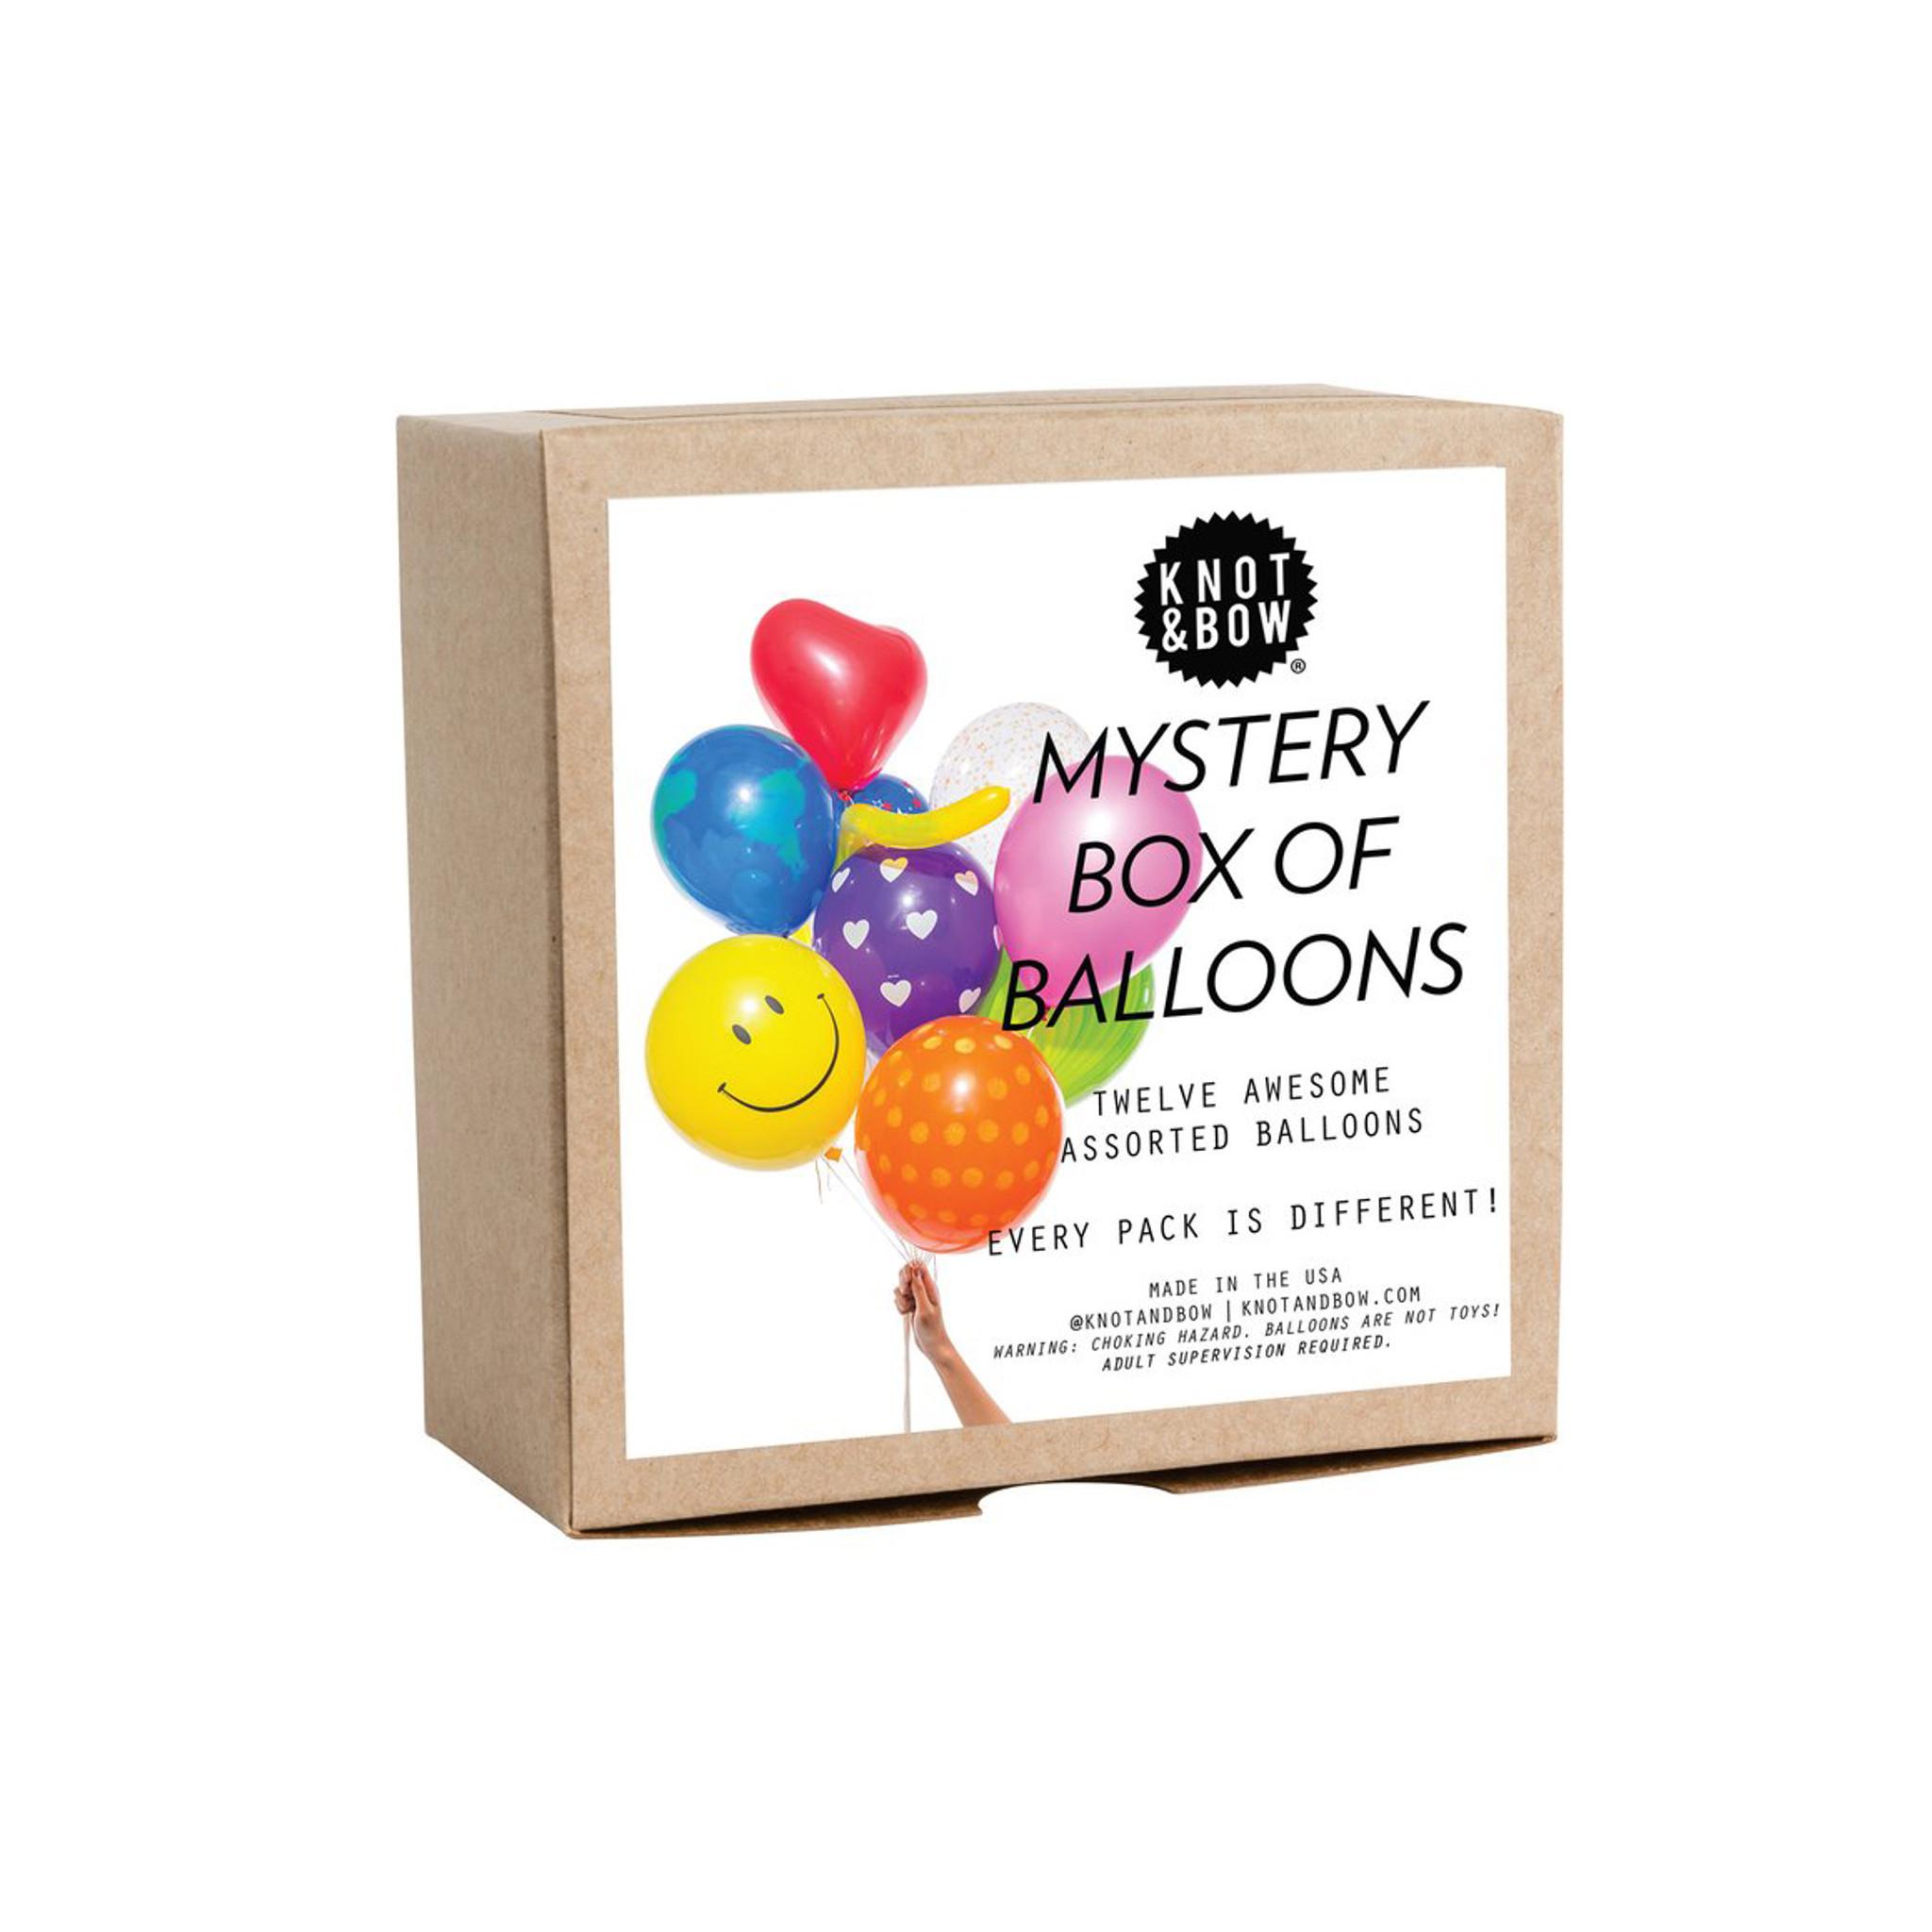 Mystery Box of Balloons